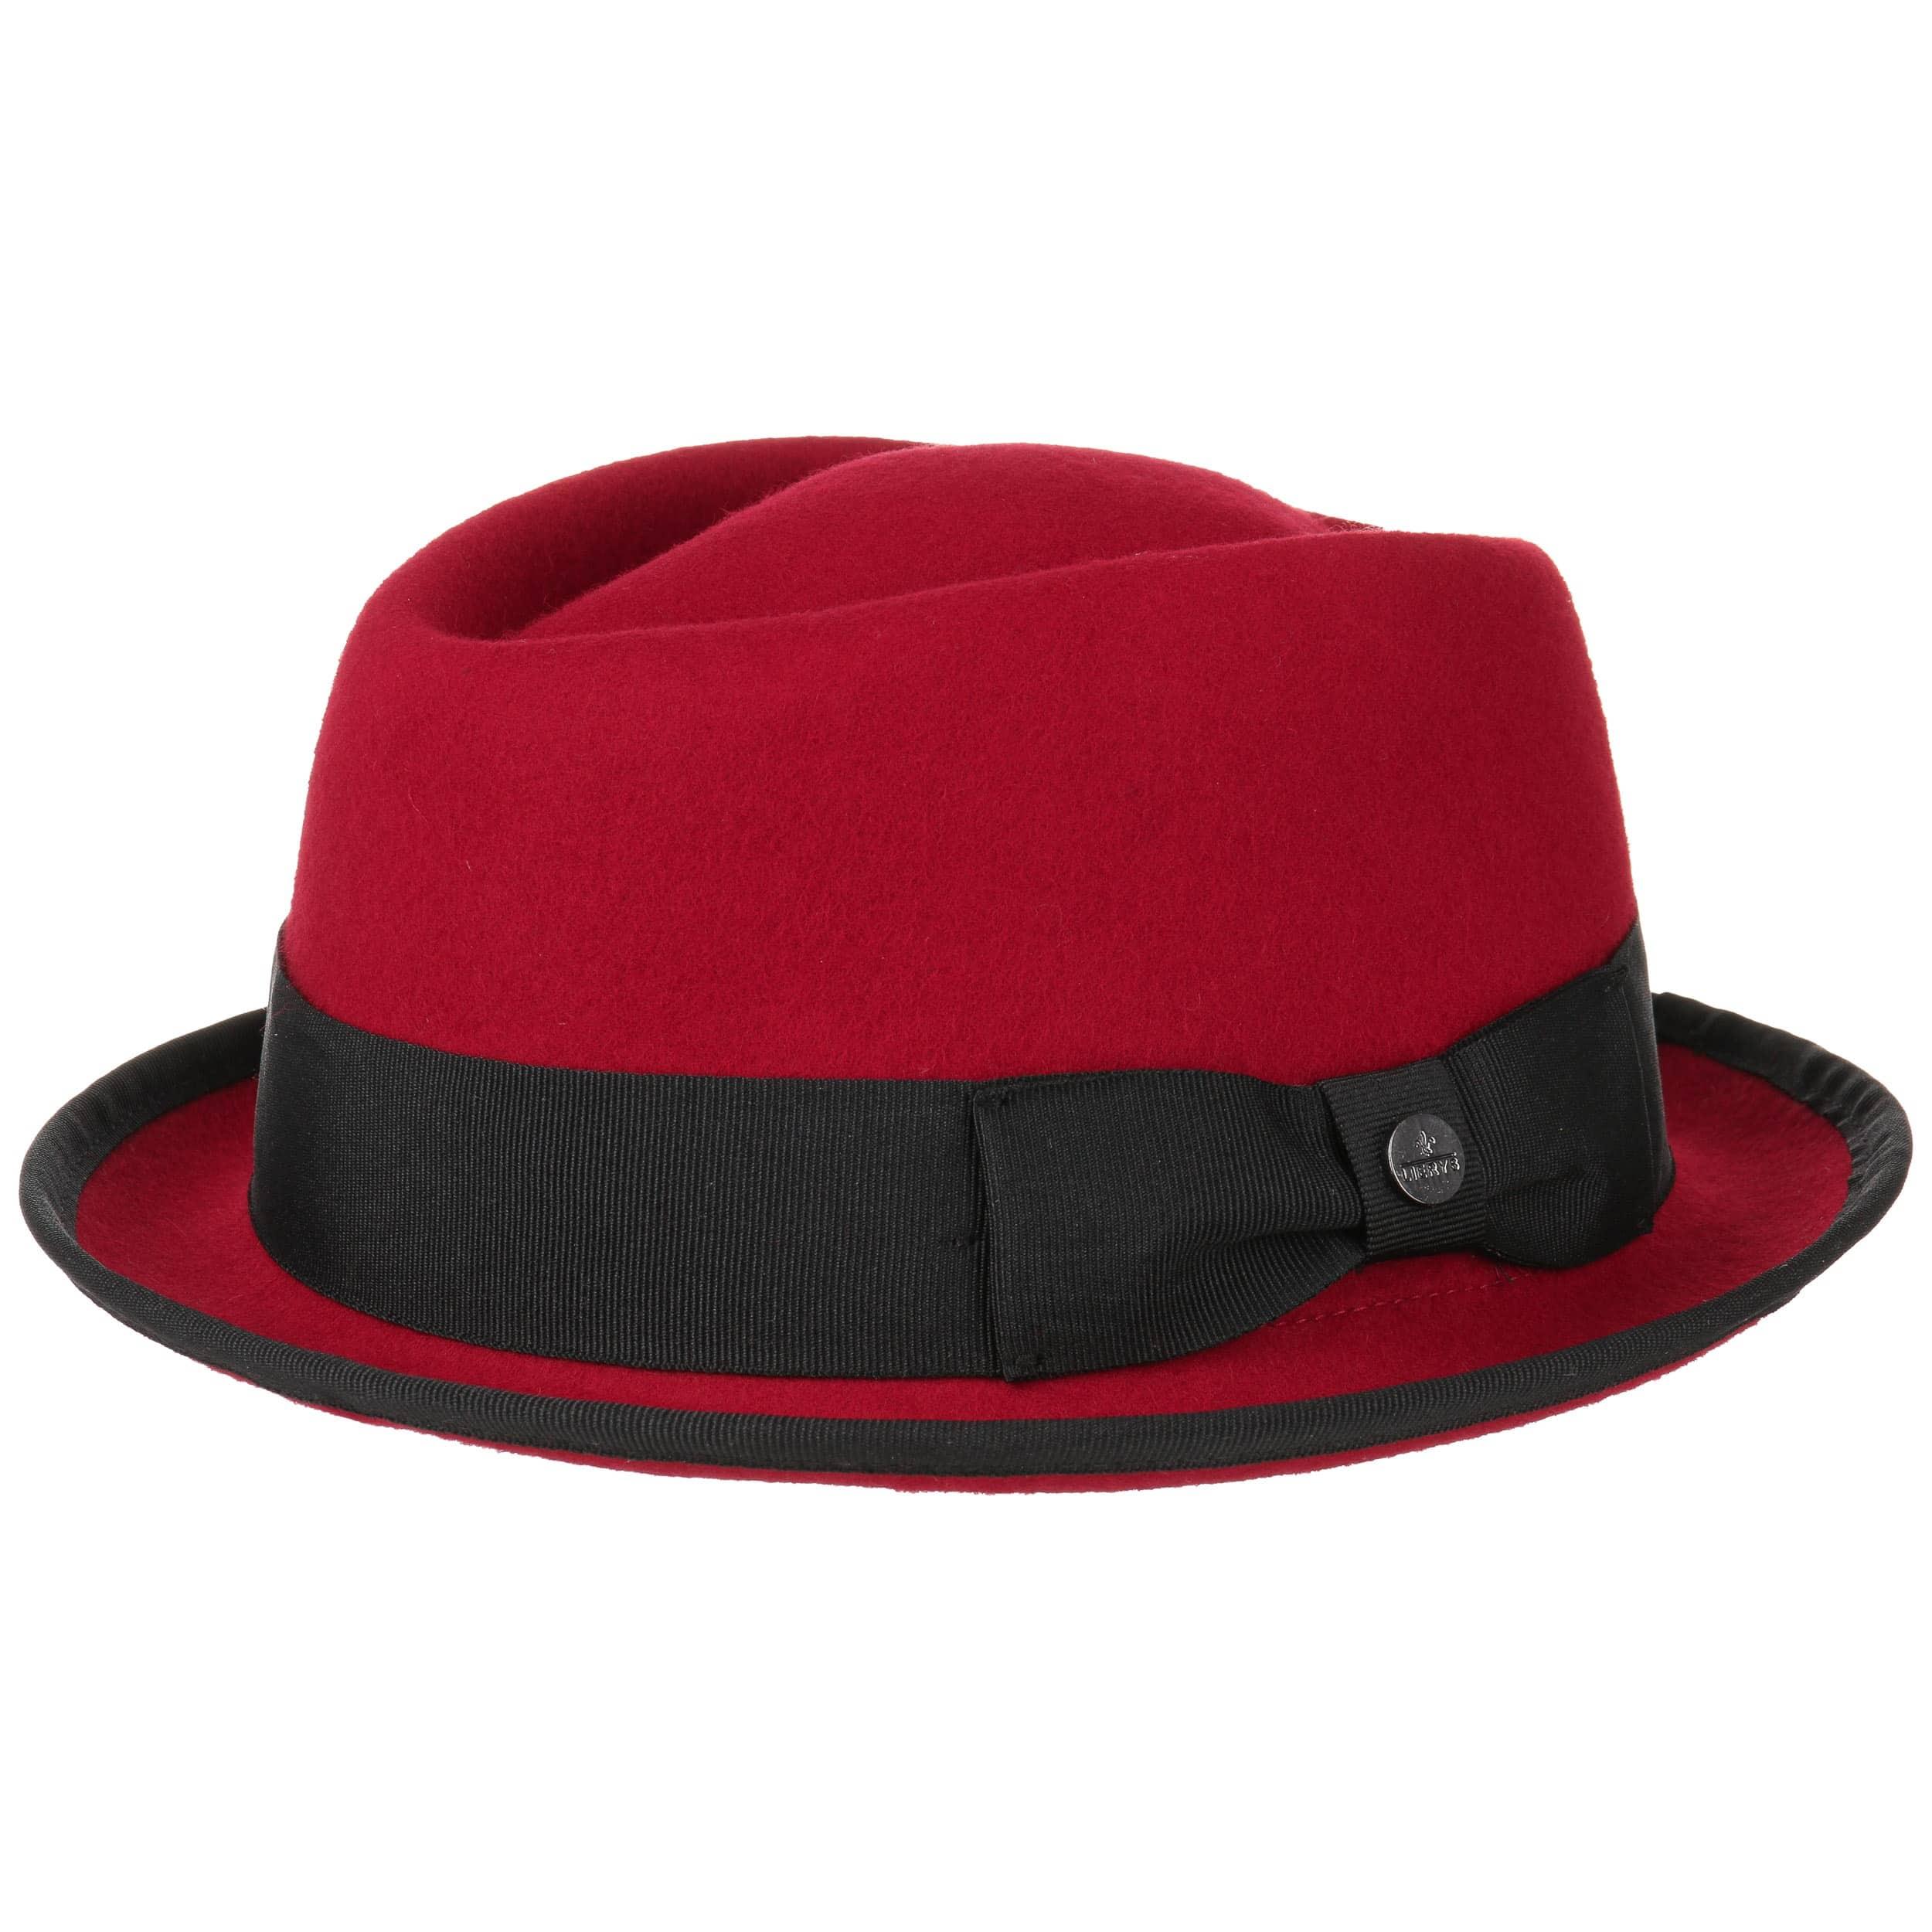 5e64b9904aabe ... Fedora Pork Pie Hat by Lierys - red 4 ...